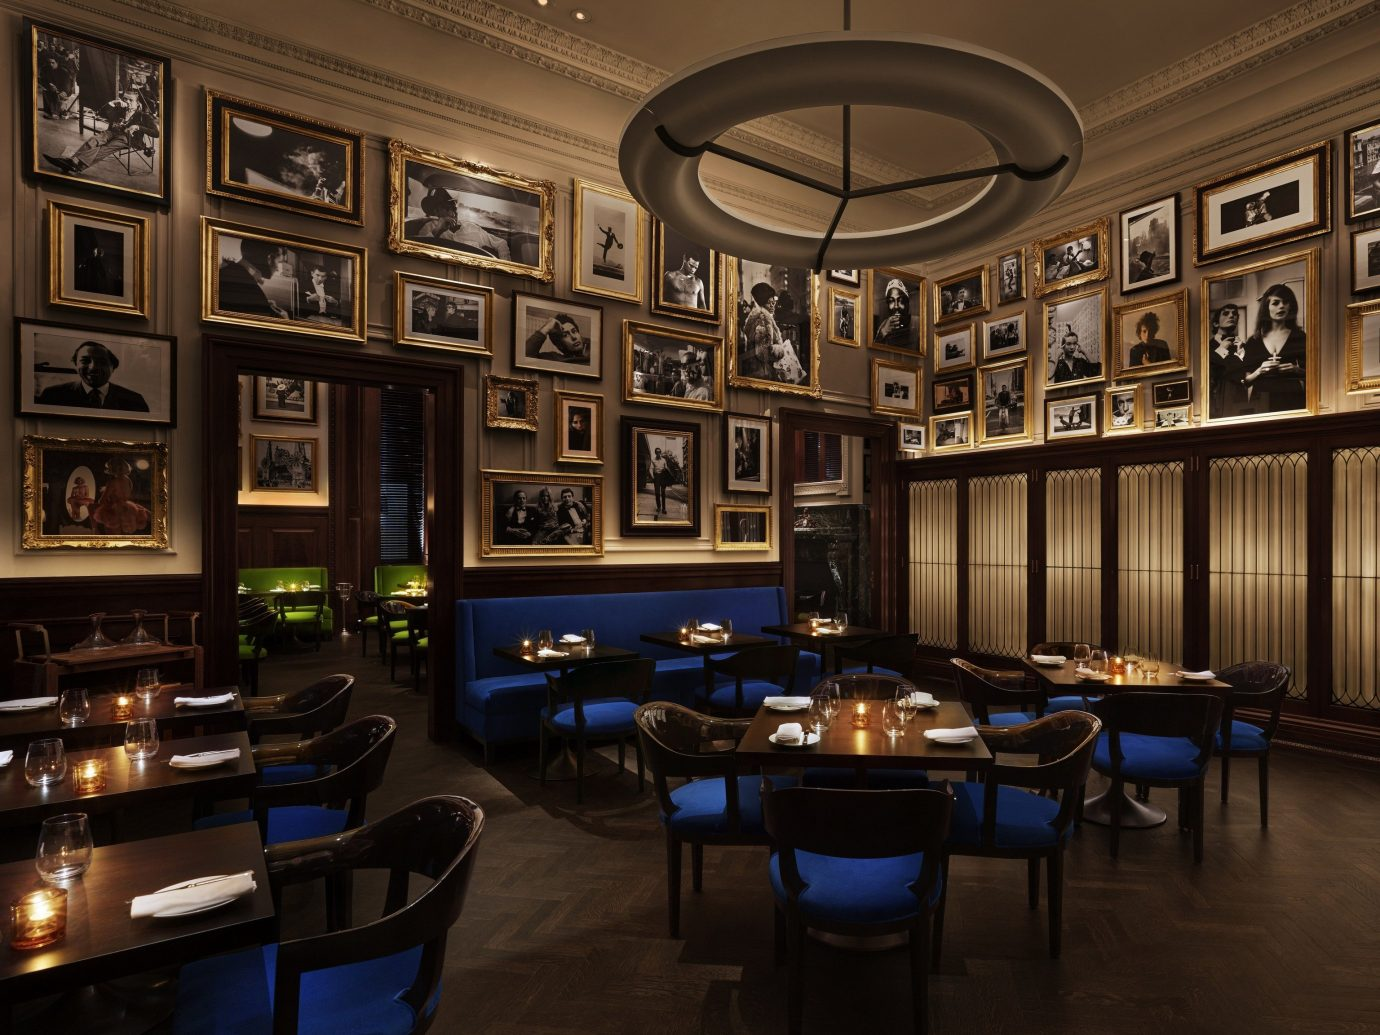 Food + Drink Romance indoor floor room building ceiling estate interior design recreation room Bar lighting Lobby restaurant furniture several